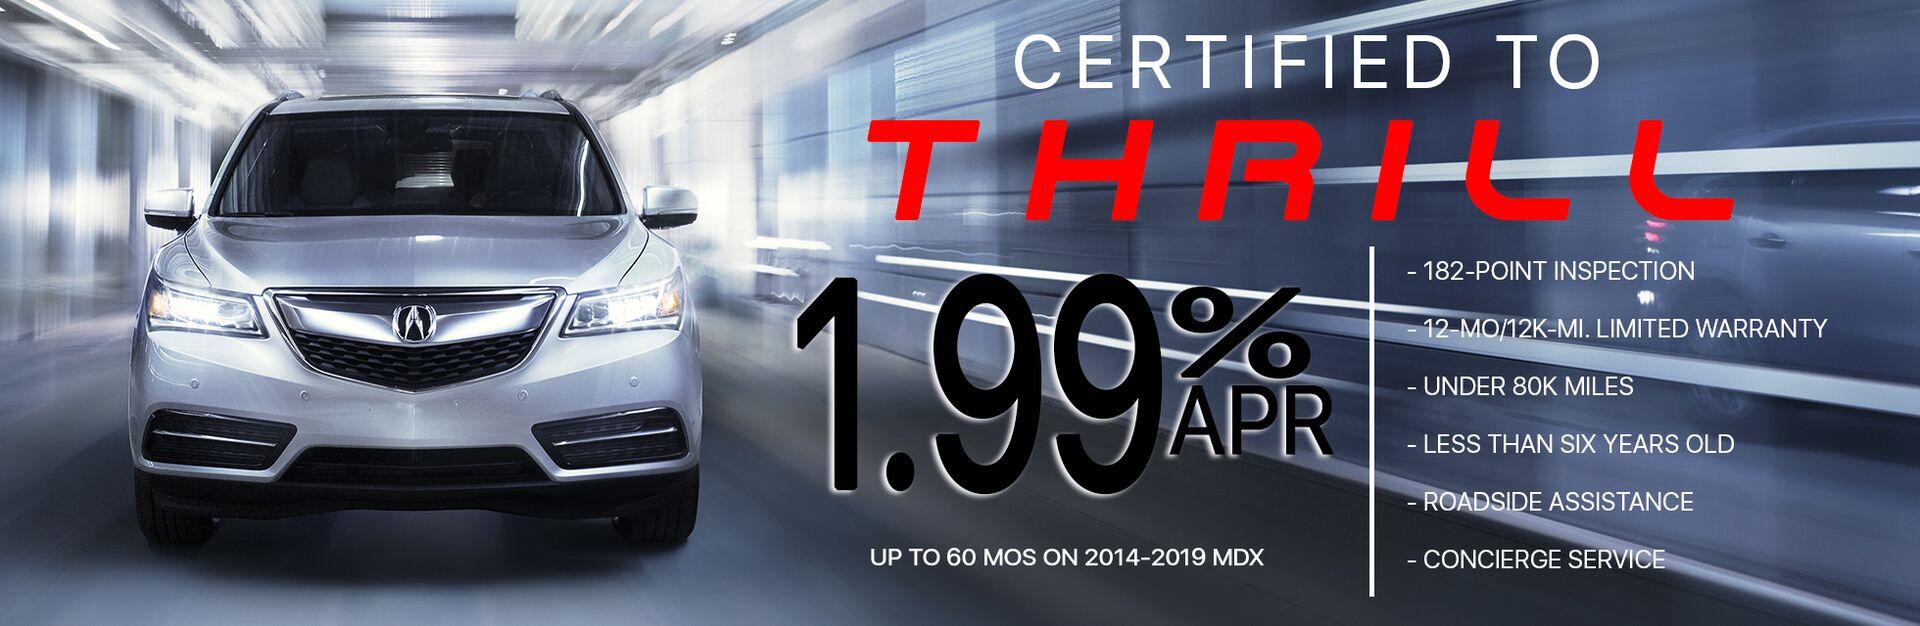 Acura Roadside Assistance >> New Pre Owned Acura Dealership Marin Acura Bay Area Ca